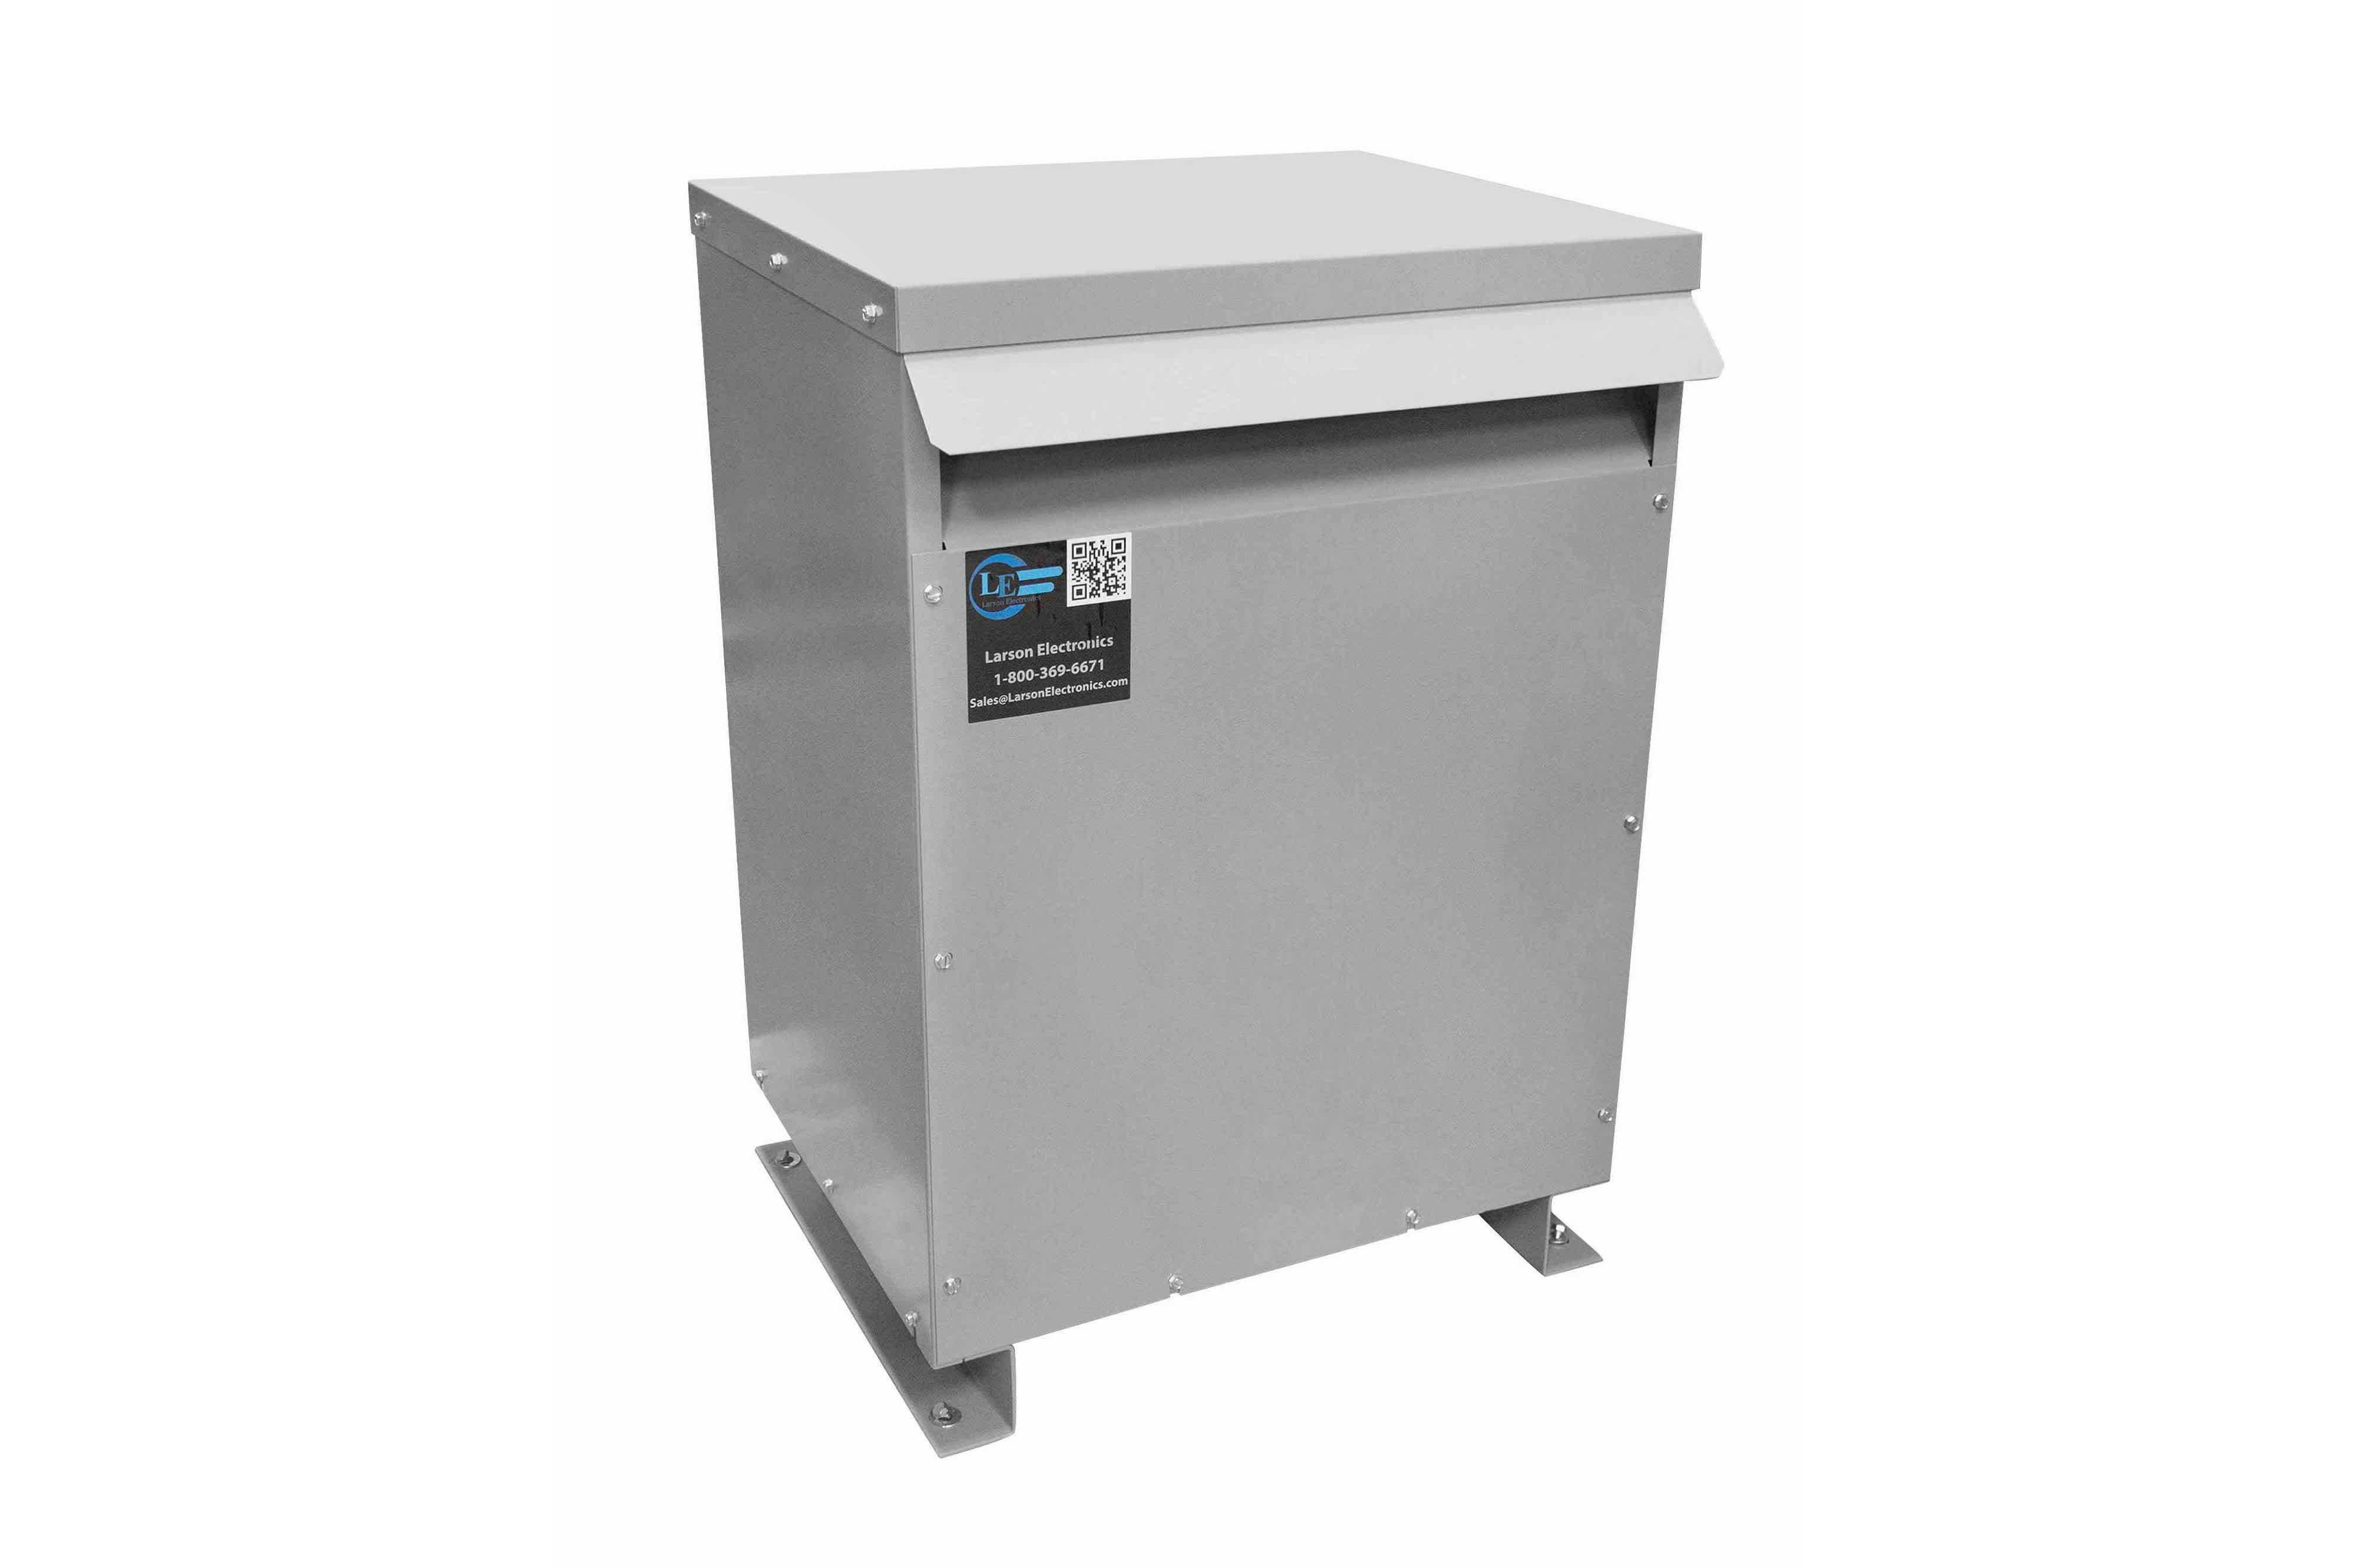 600 kVA 3PH Isolation Transformer, 208V Wye Primary, 415V Delta Secondary, N3R, Ventilated, 60 Hz